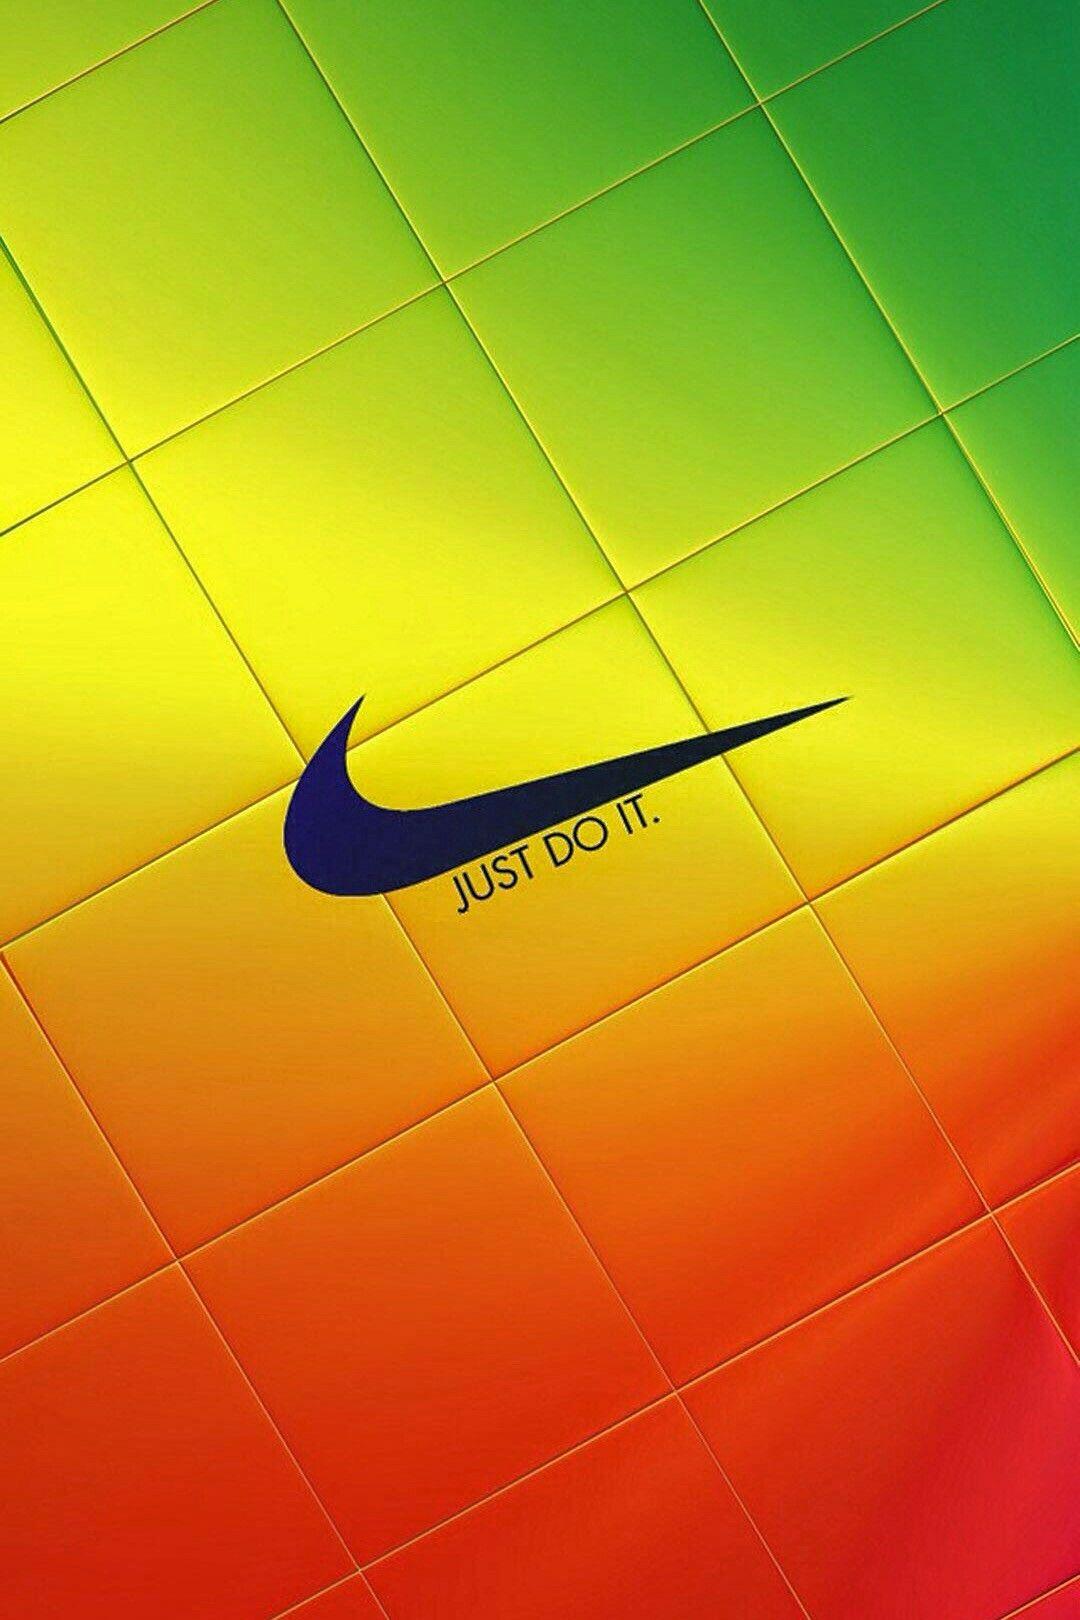 Pin De Drippy Penz En Shoes Boots Heels Descargas De Fondos De Pantalla Fondos De Pantalla Nike Fondos De Pantallas Hipster